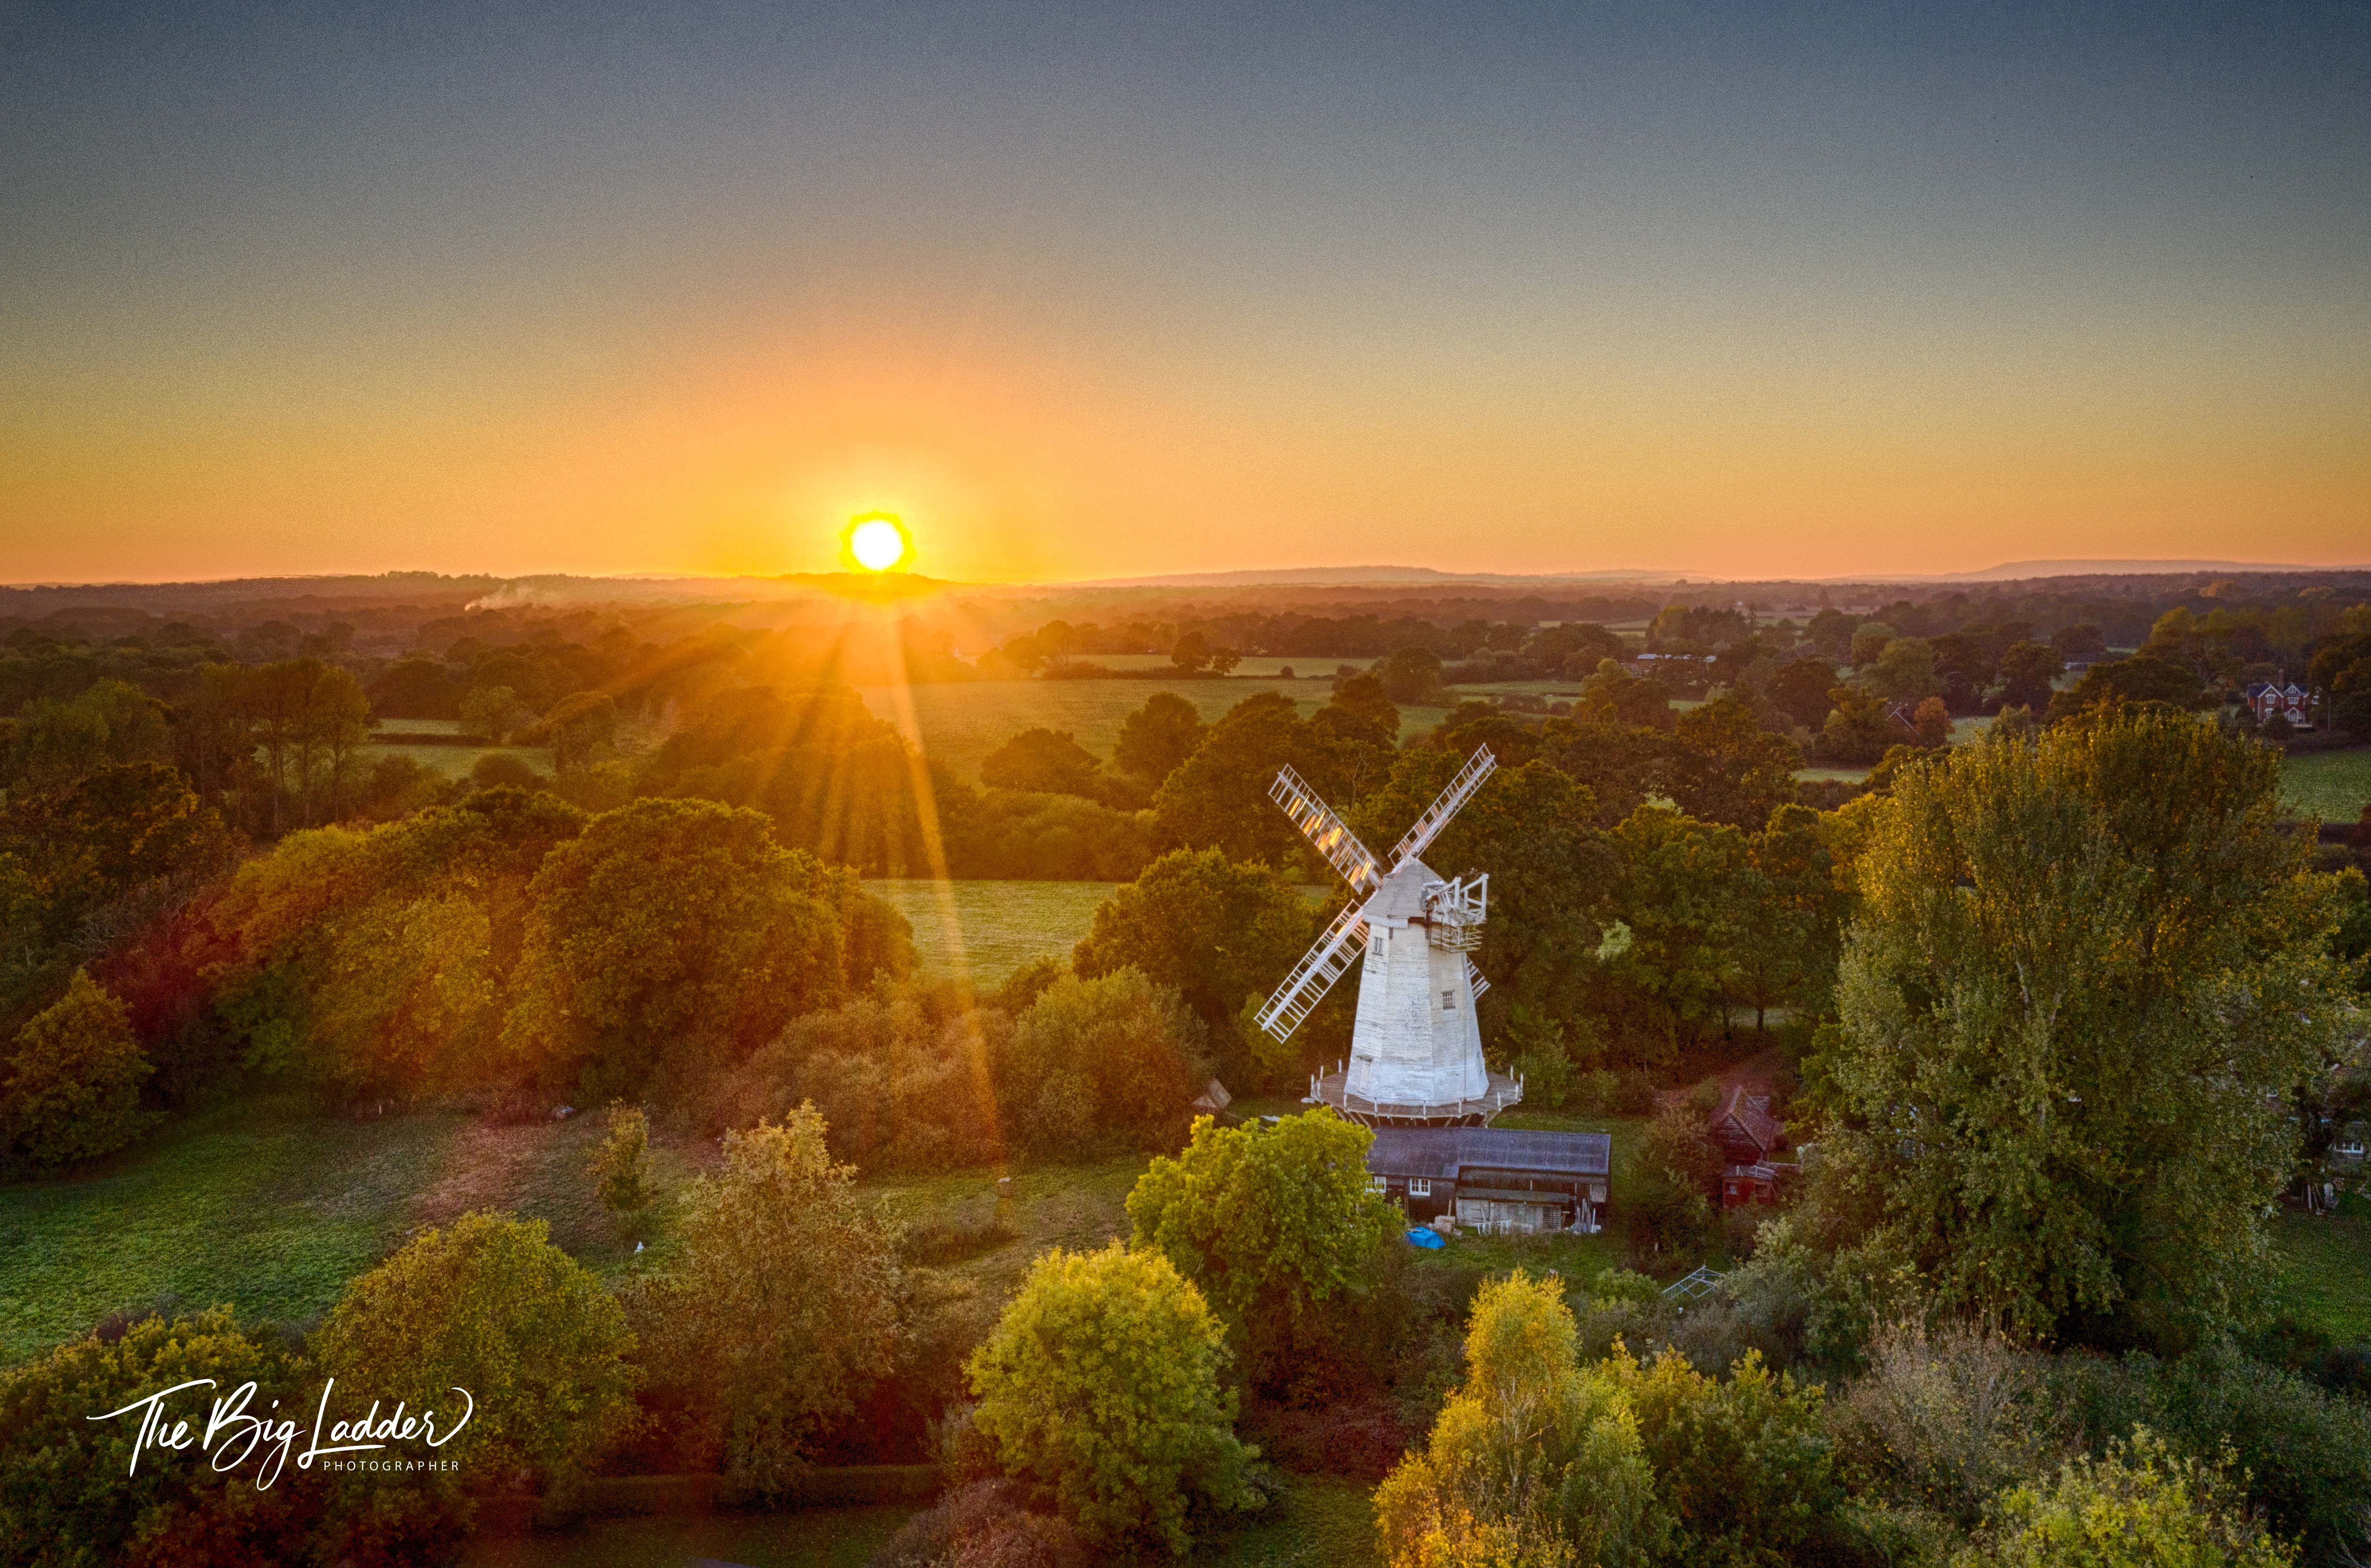 Jonathan Creeks Windmill